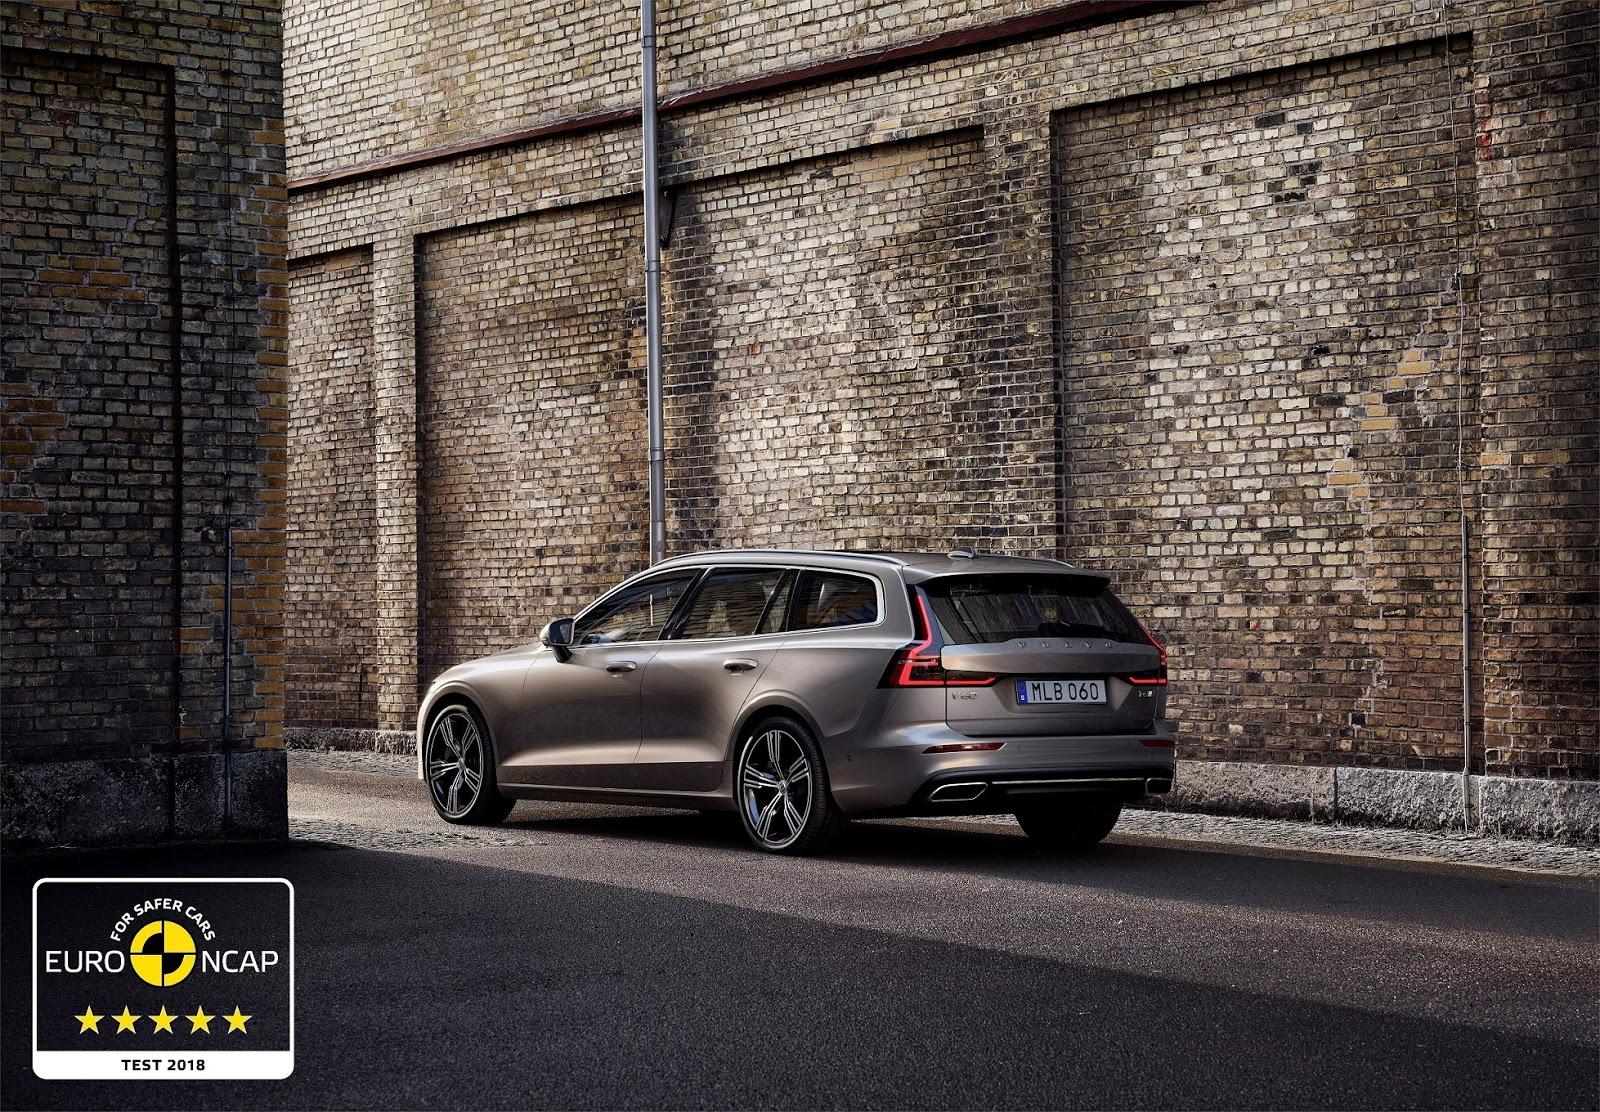 246535 Volvo S60 and V60 secure 5 star safety rating by Euro NCAP1 Συνεχίζουν το σερί 5 αστέρων τα Volvo S60 και V60 crash tests, Euro NCAP, Volvo, Volvo S60, Volvo V60